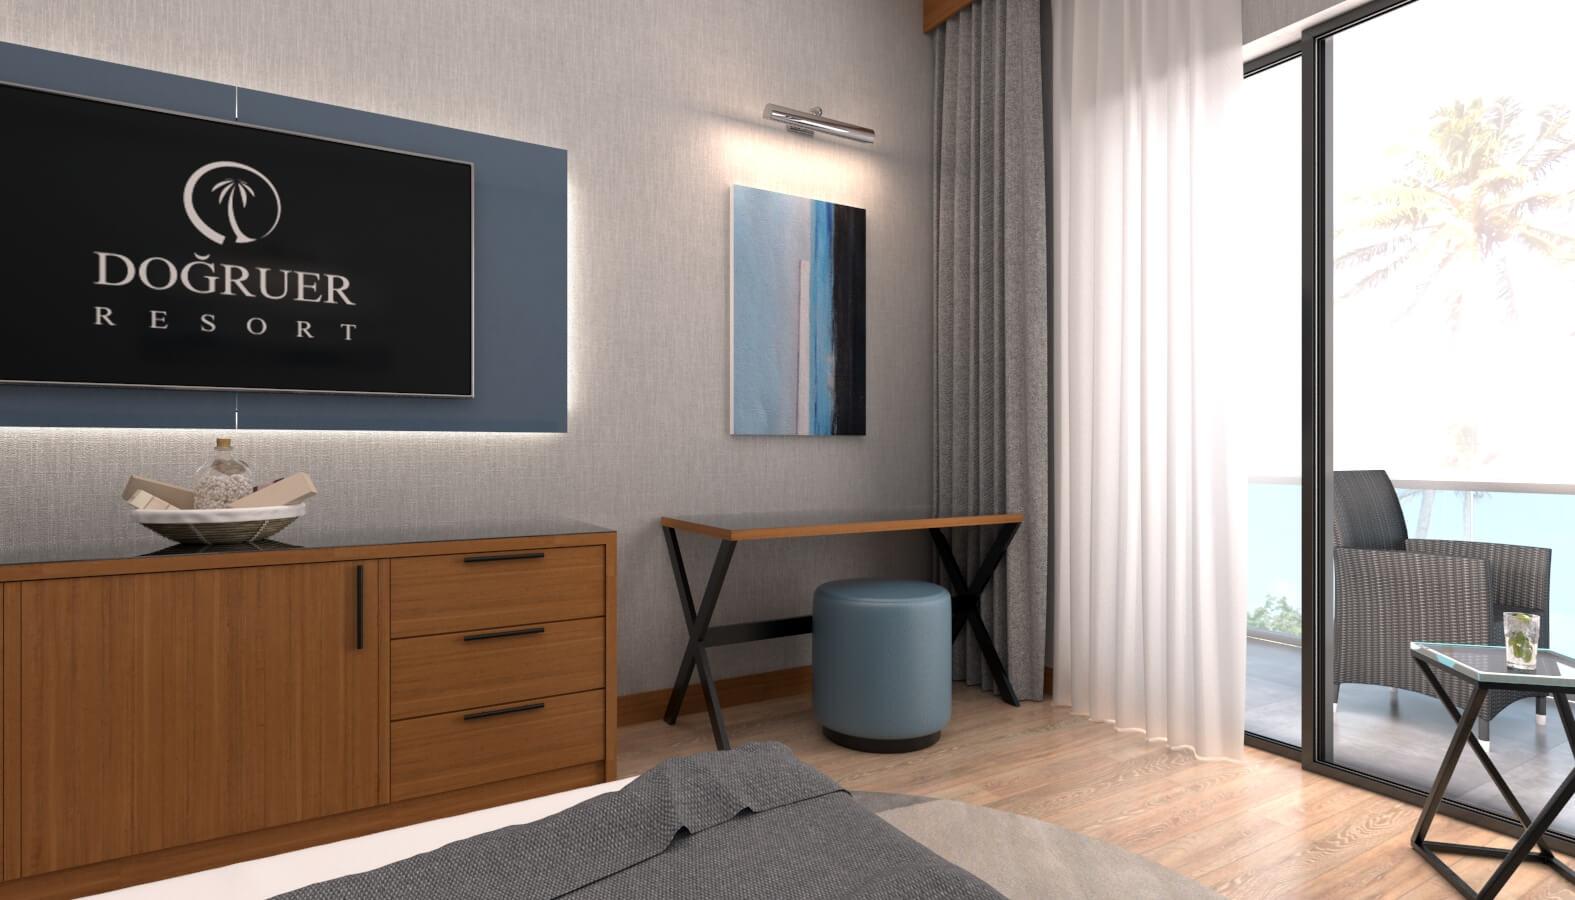 reception design 3608 Dogruer hotel Hotels